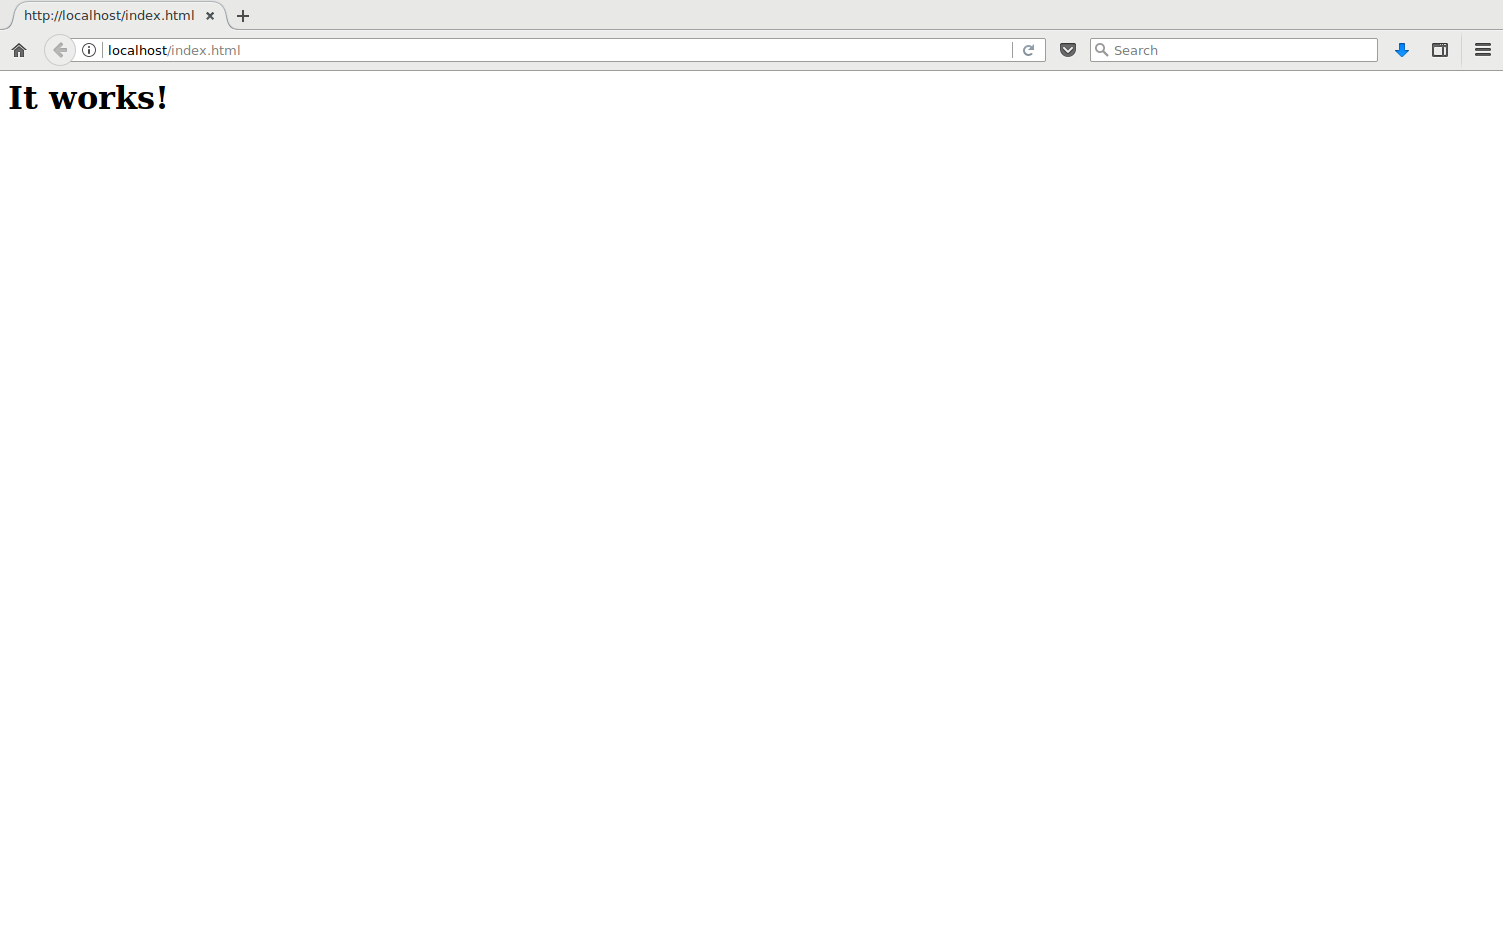 Screenshot: It works!